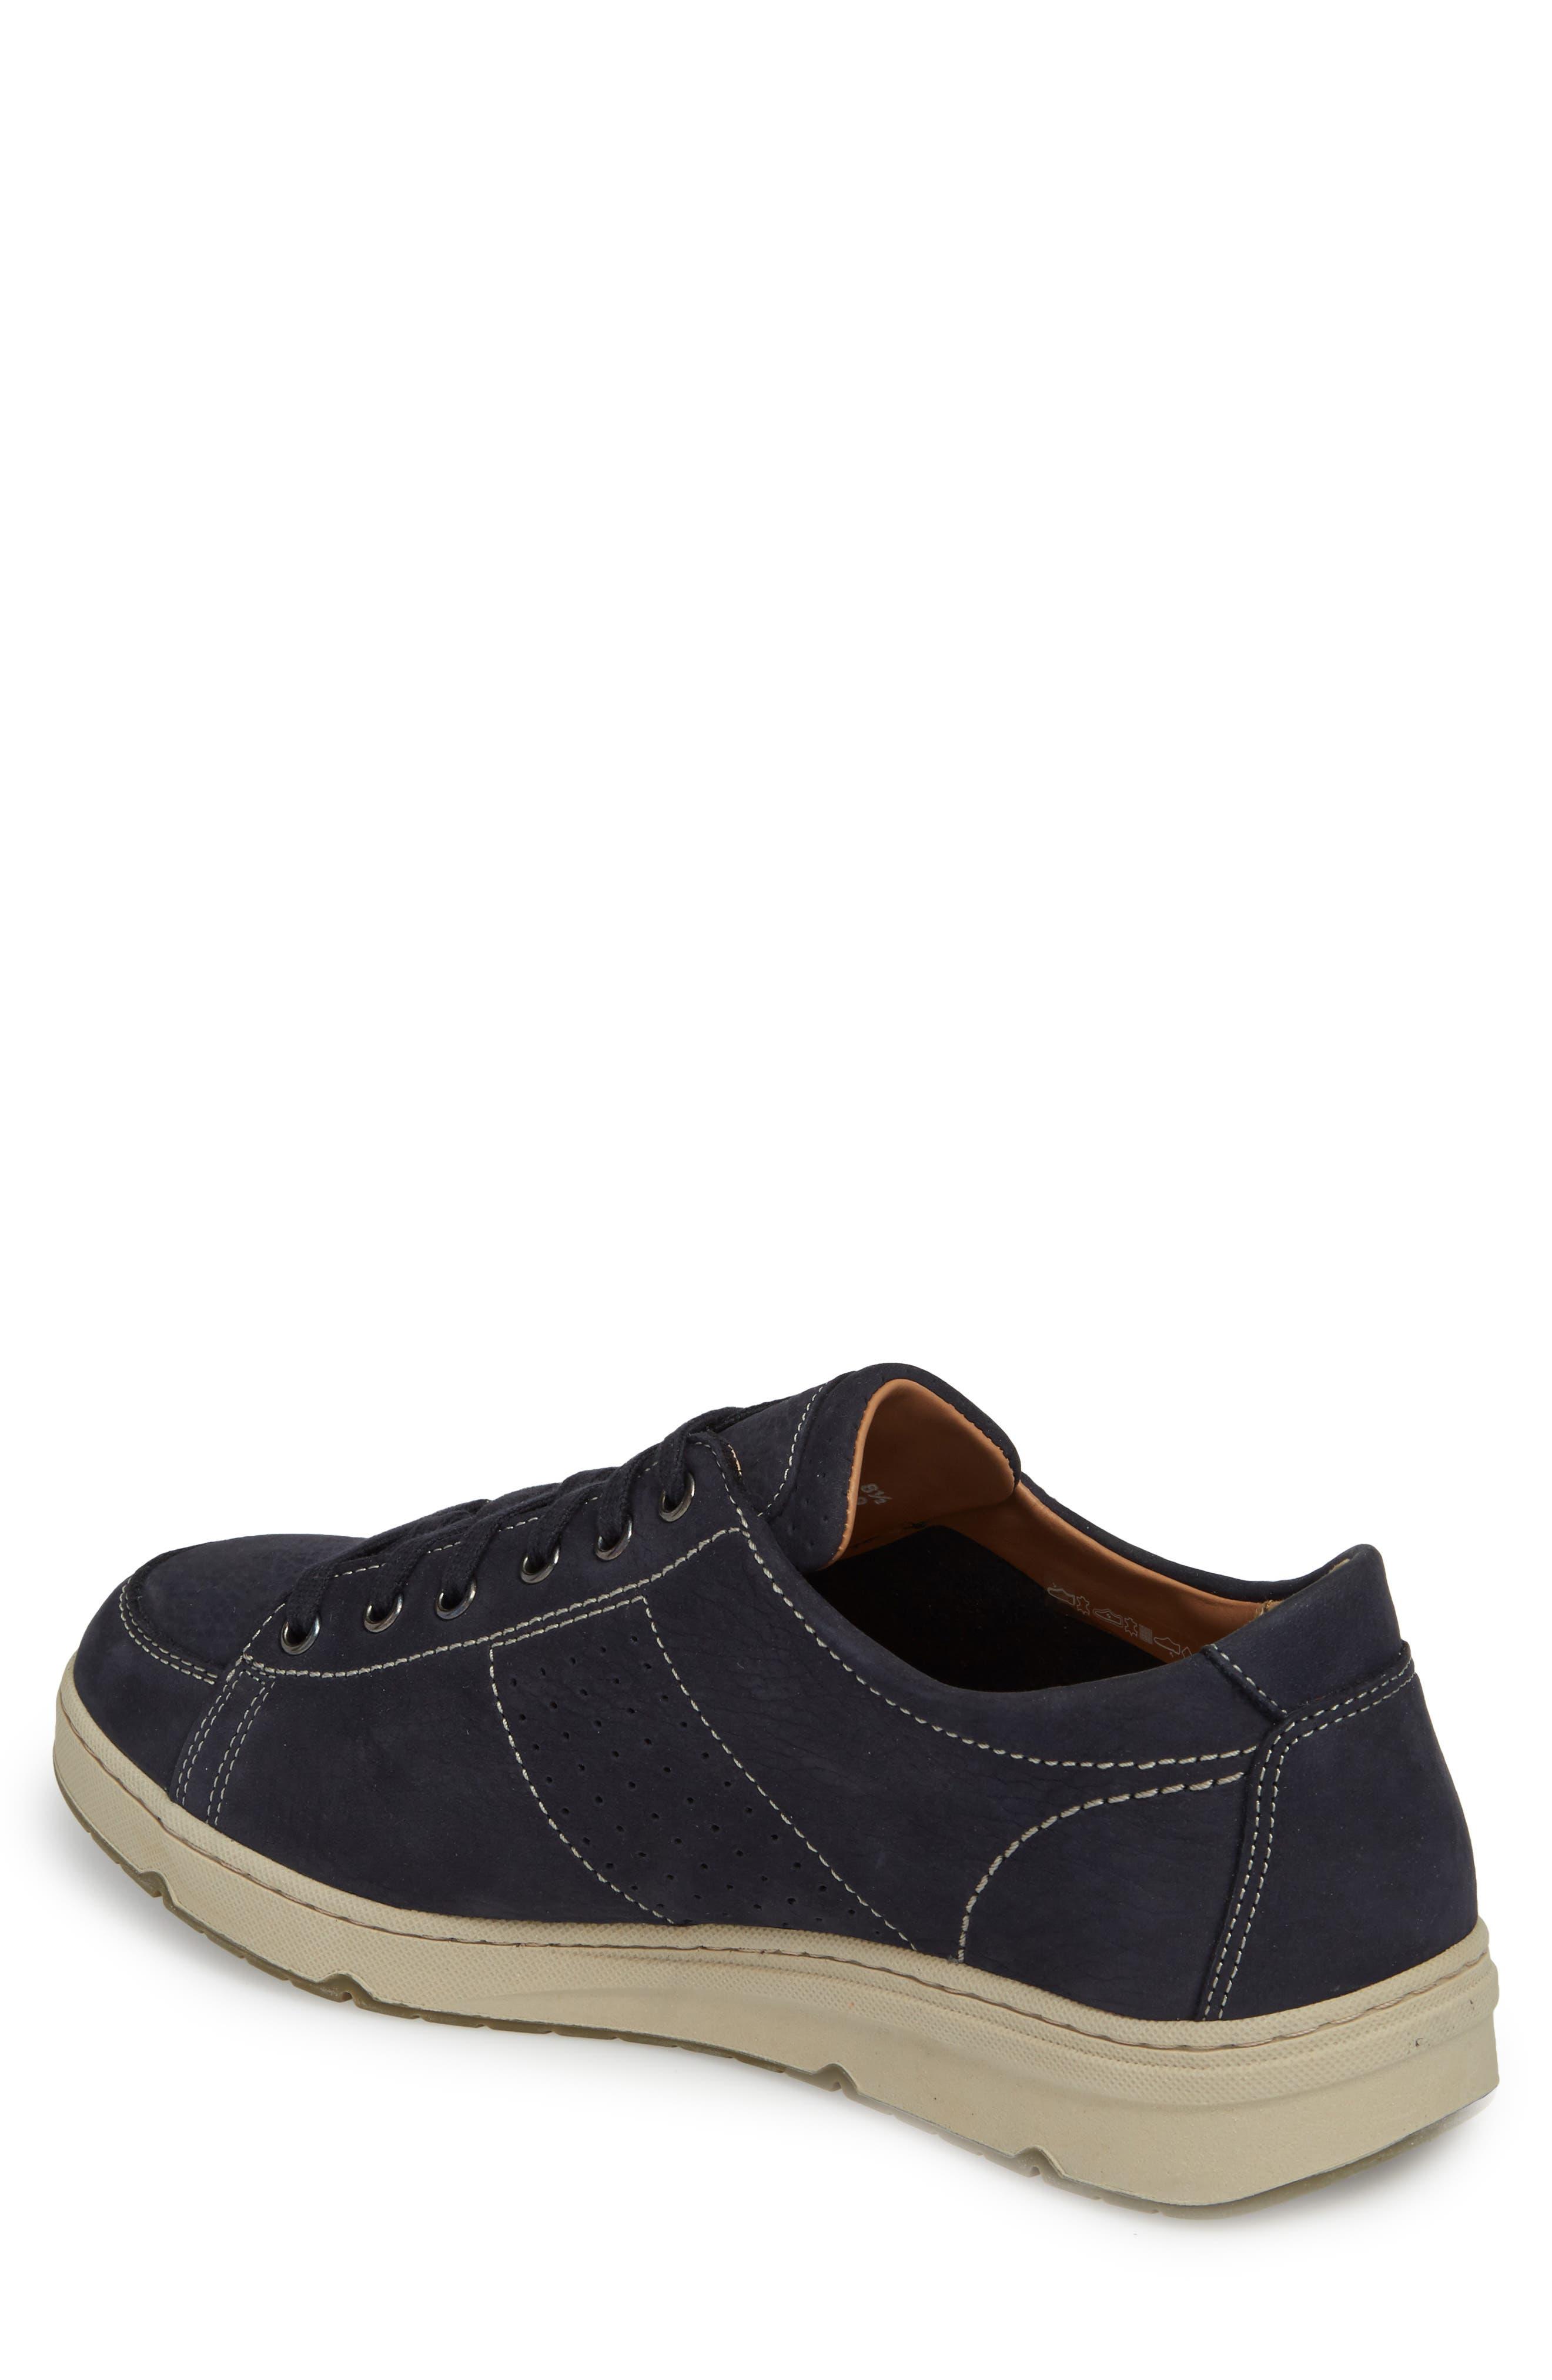 MEPHISTO, Jerome Sneaker, Alternate thumbnail 2, color, 411